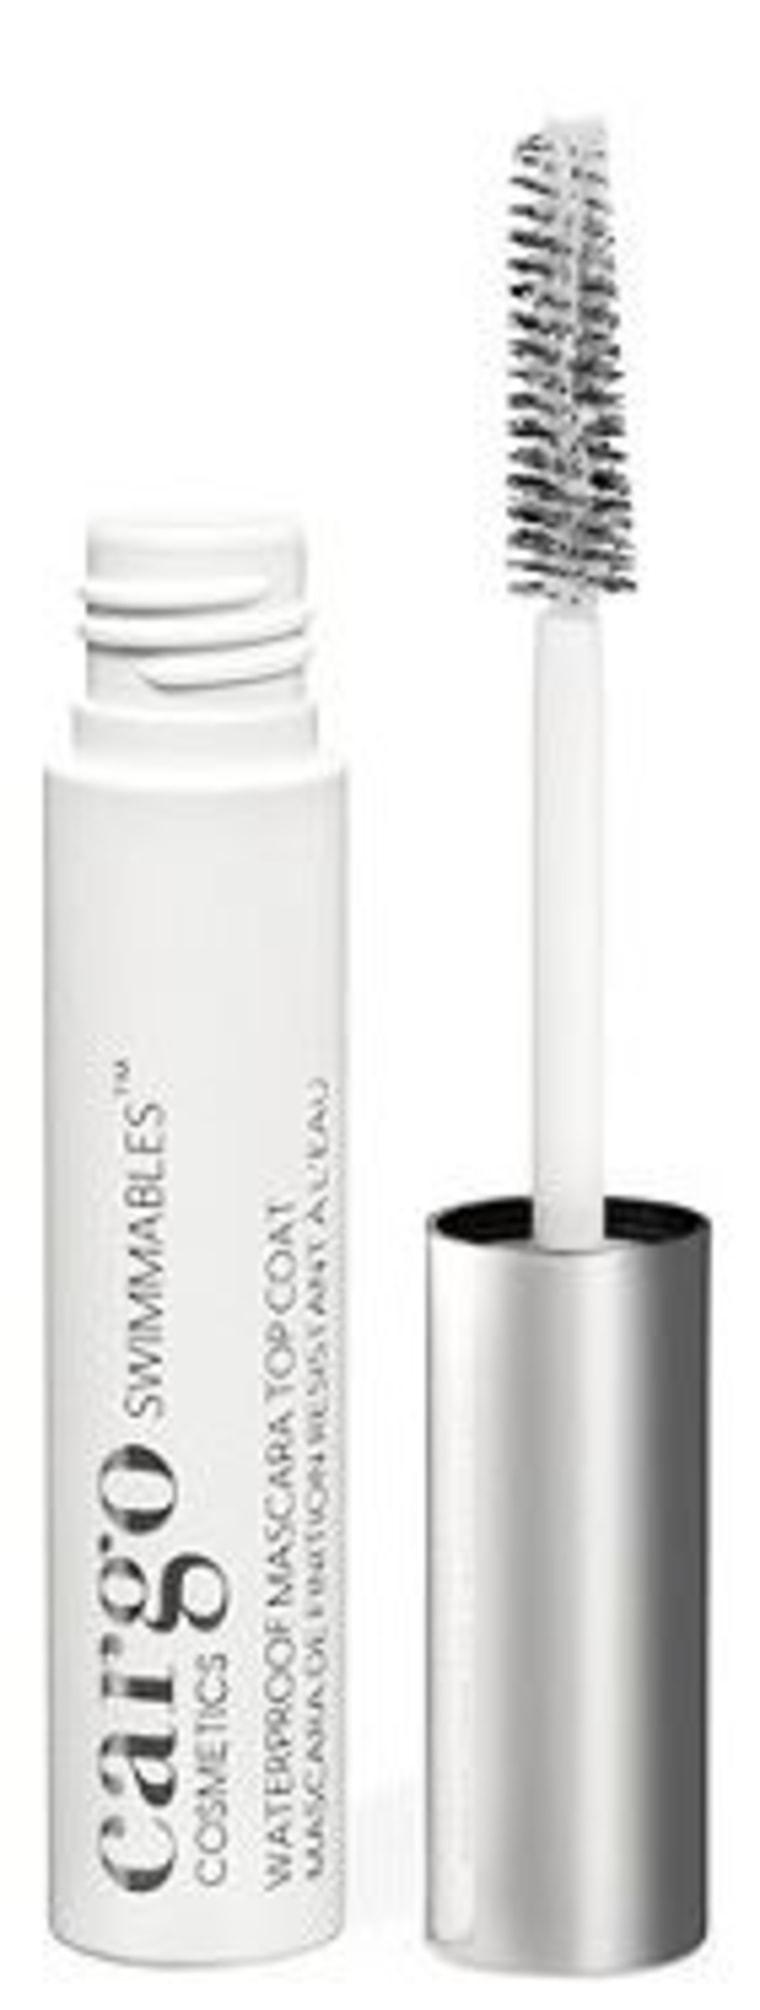 Swimmables Waterproof Mascara Topcoat